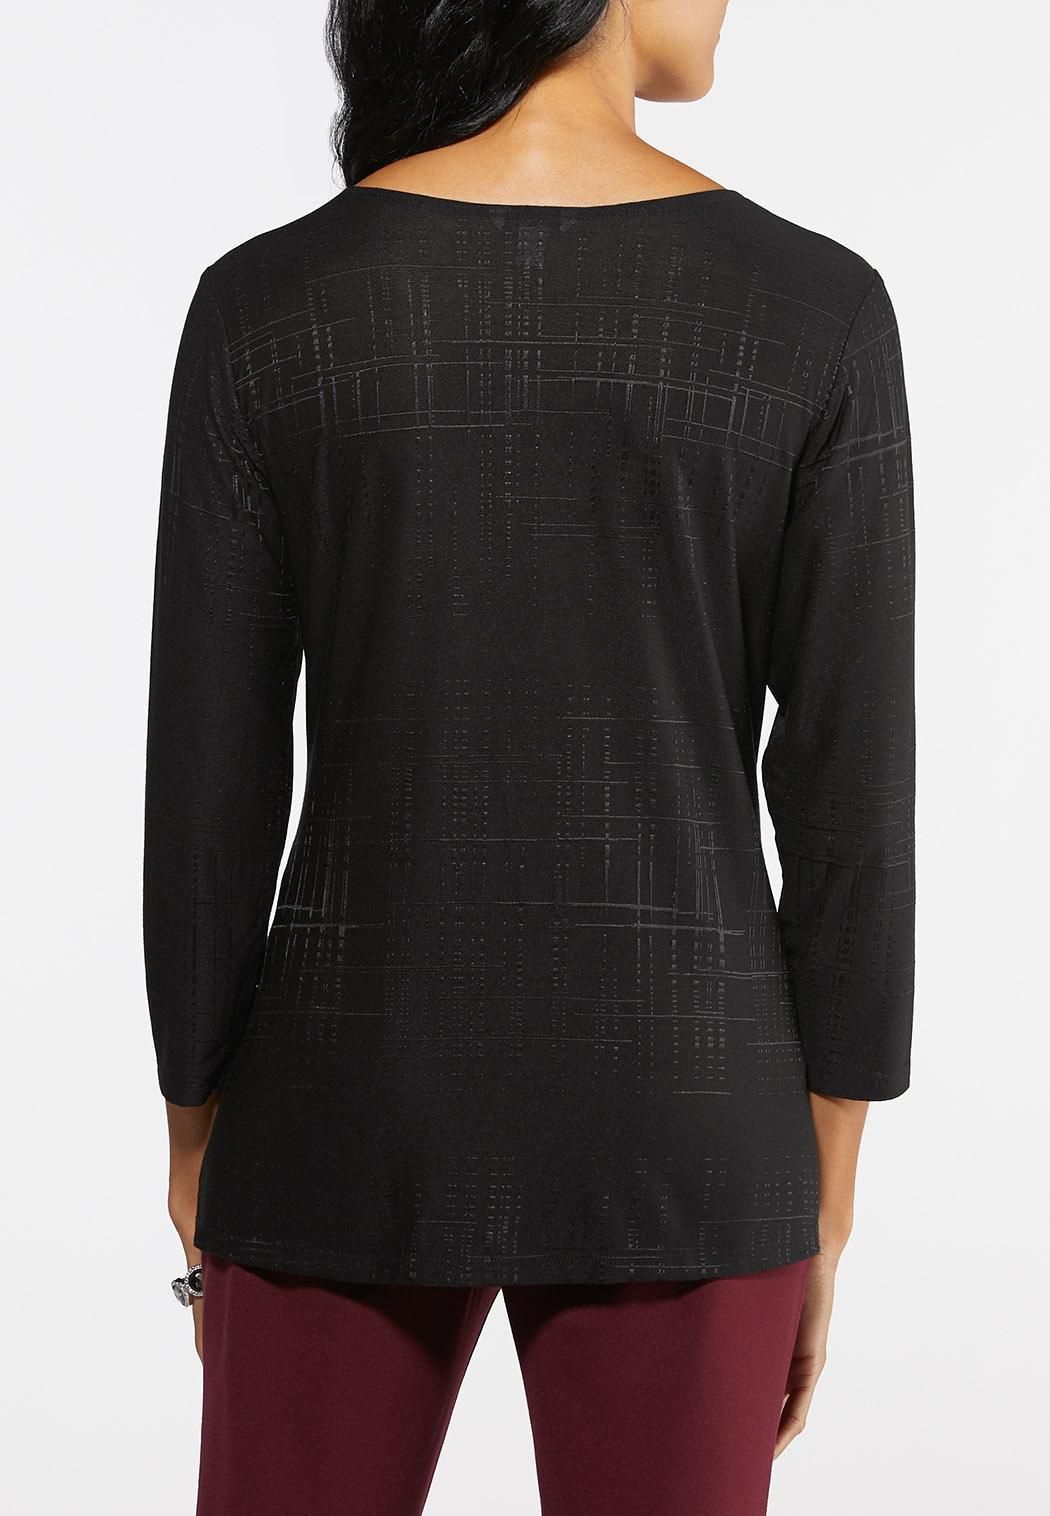 Plus Size Textured Asymmetrical Top (Item #43974504)